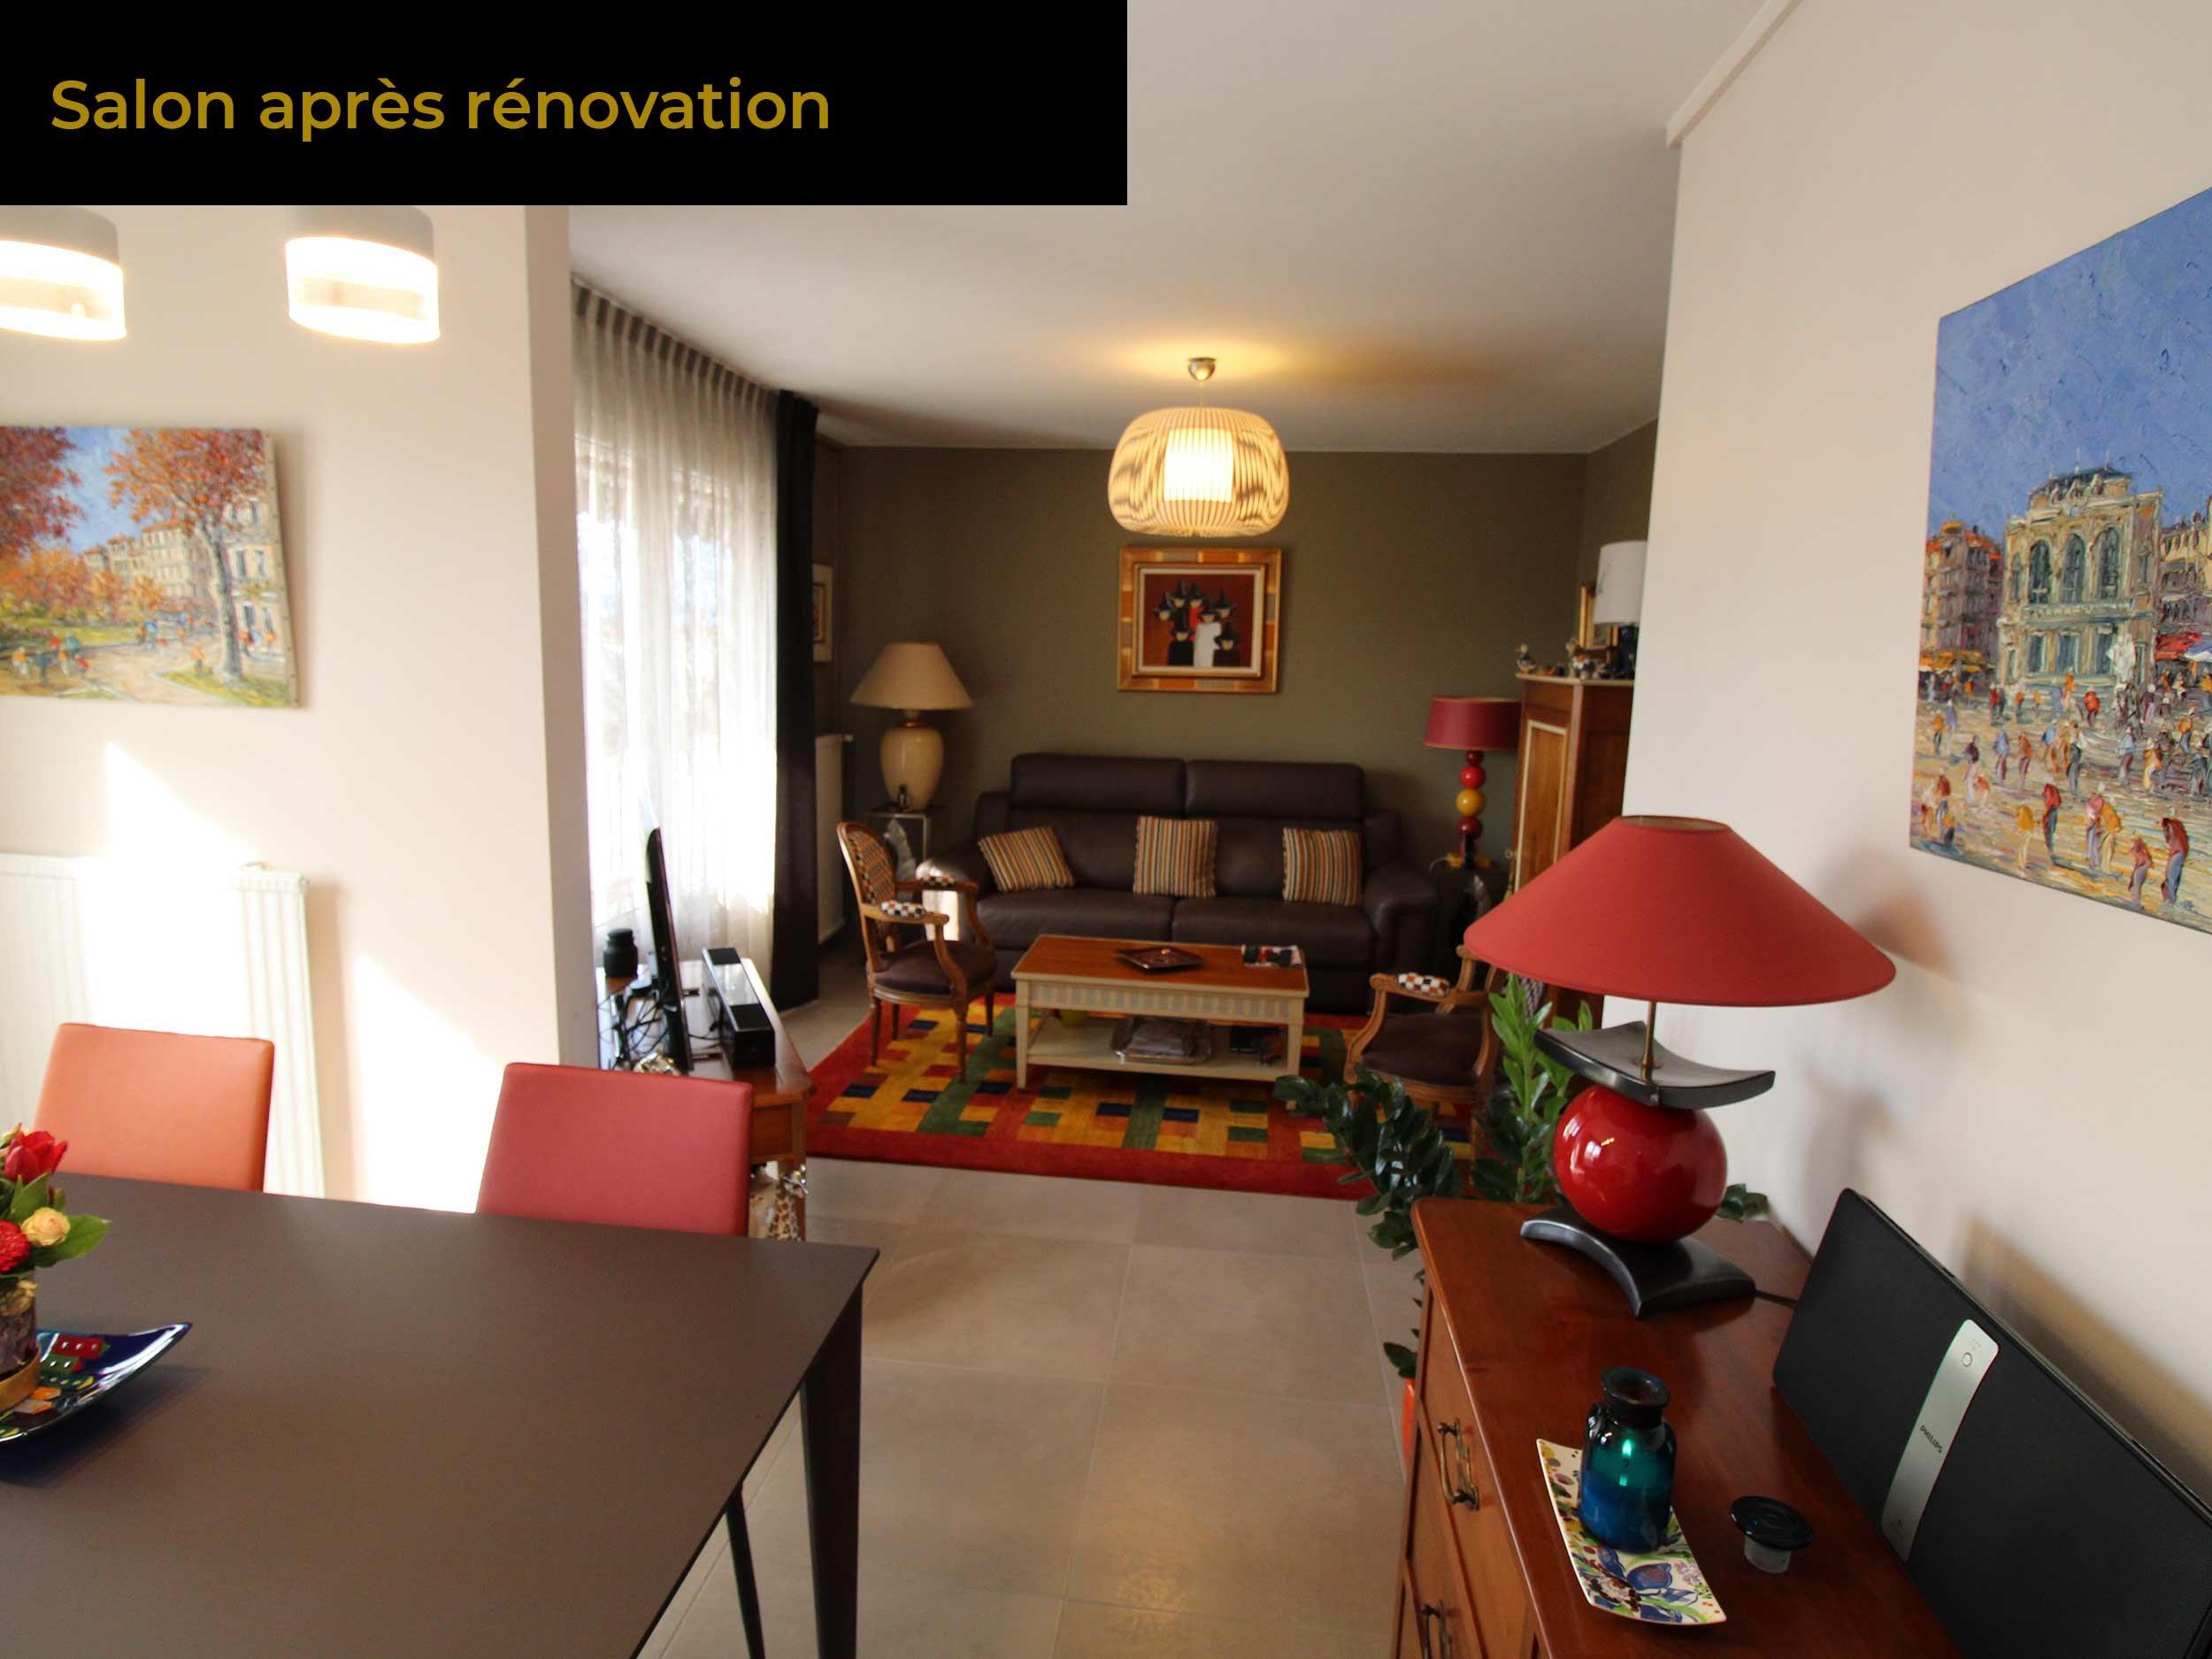 9a-salon-apres-renov